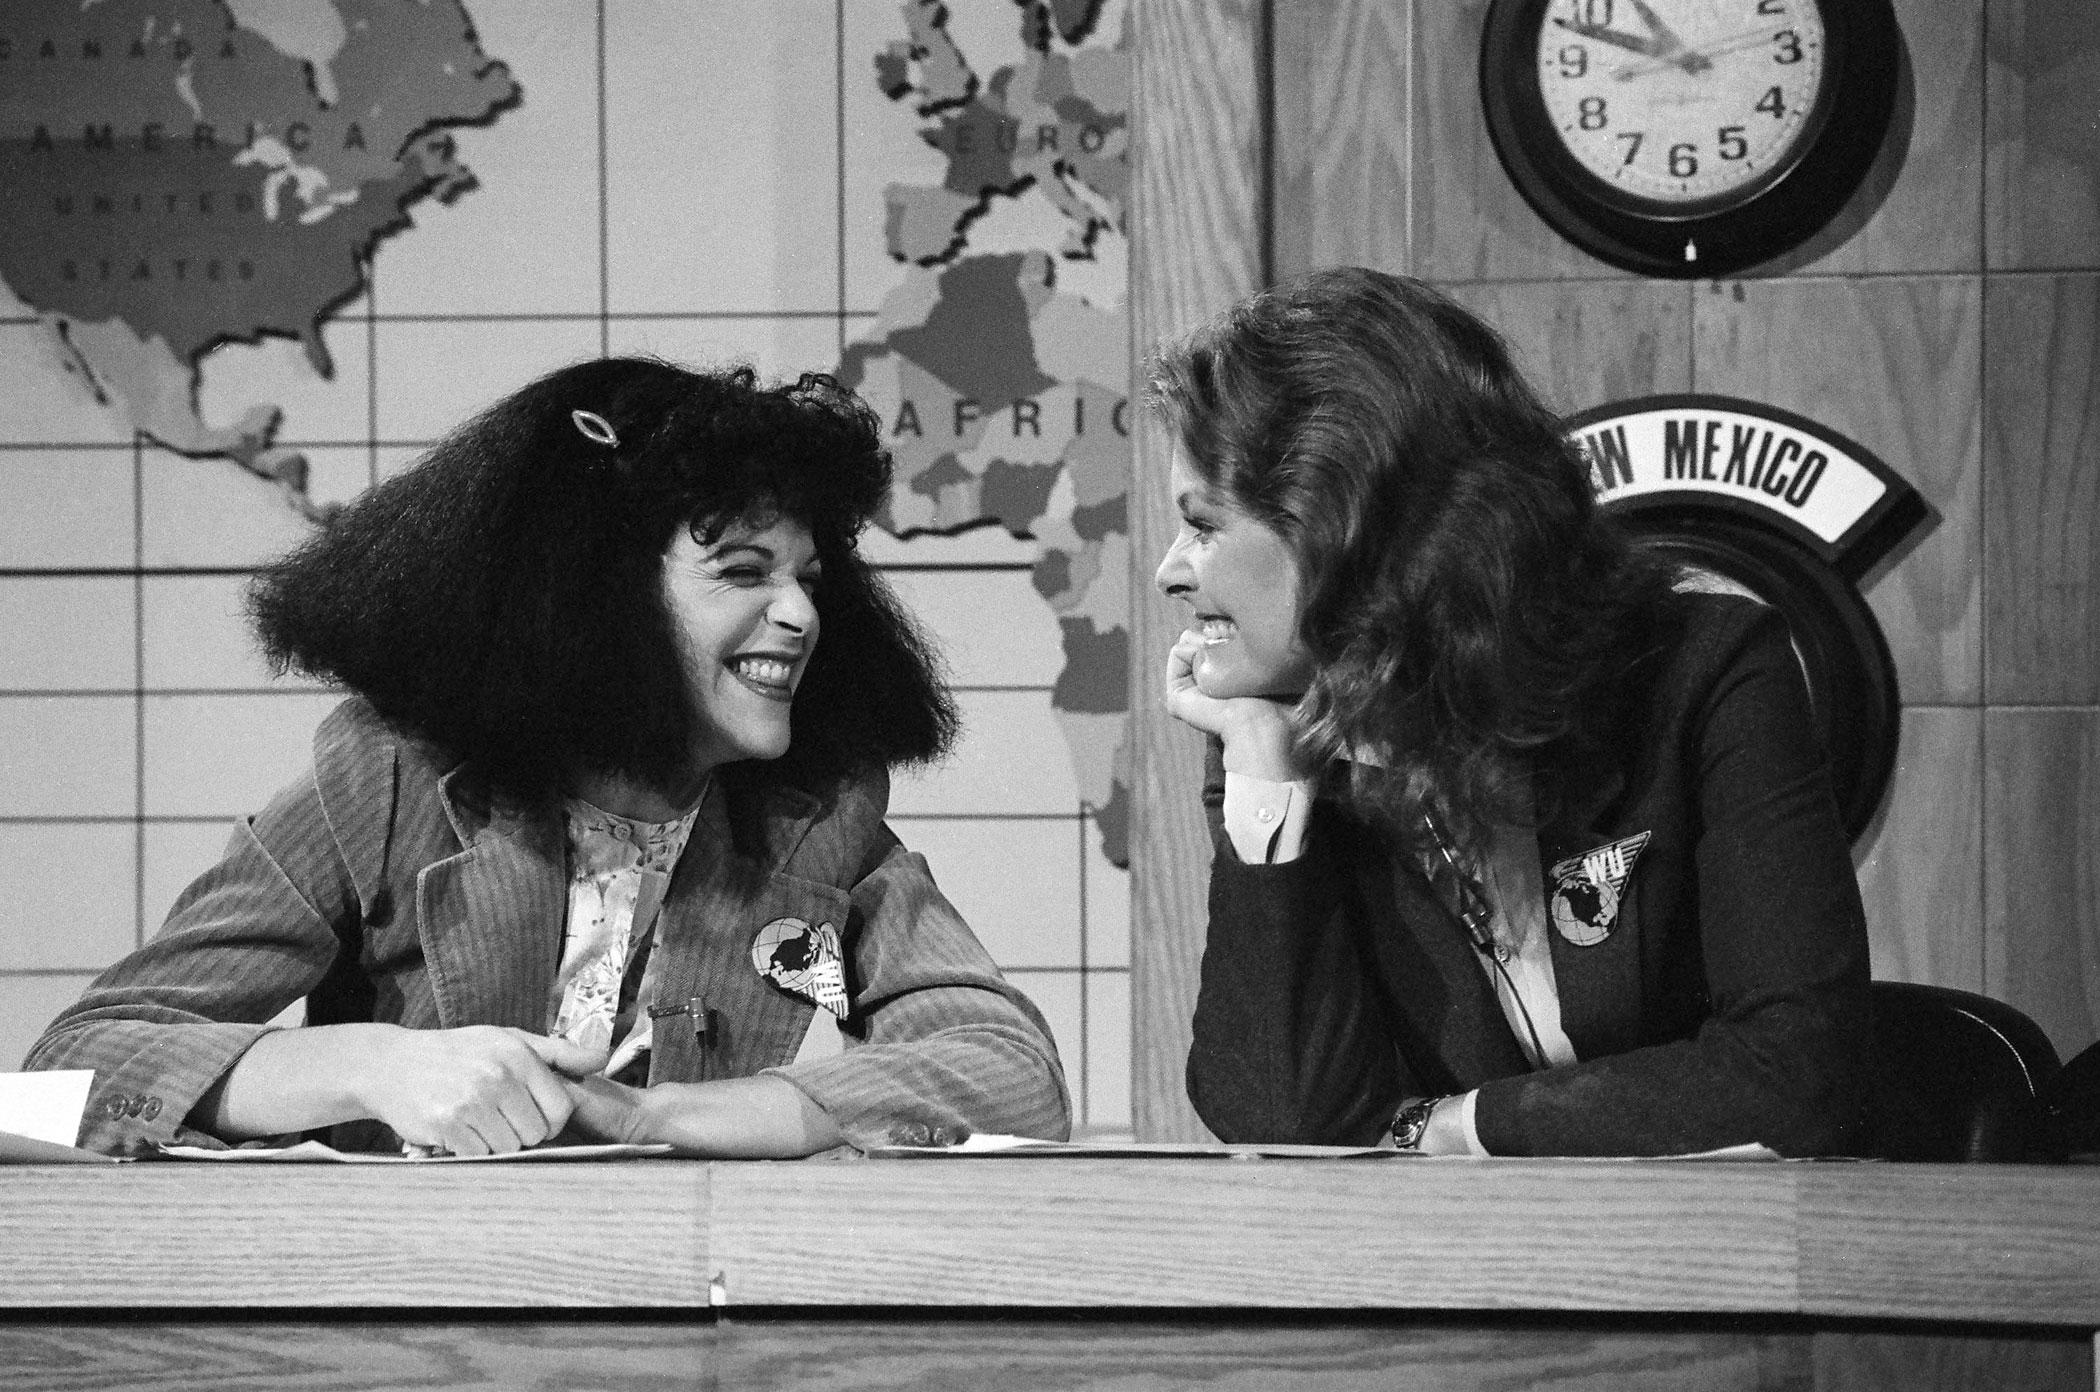 Gilda Radner as Roseanne Roseannadanna and Jane Curtin during the 'Weekend Update' skit on October 20, 1979 .